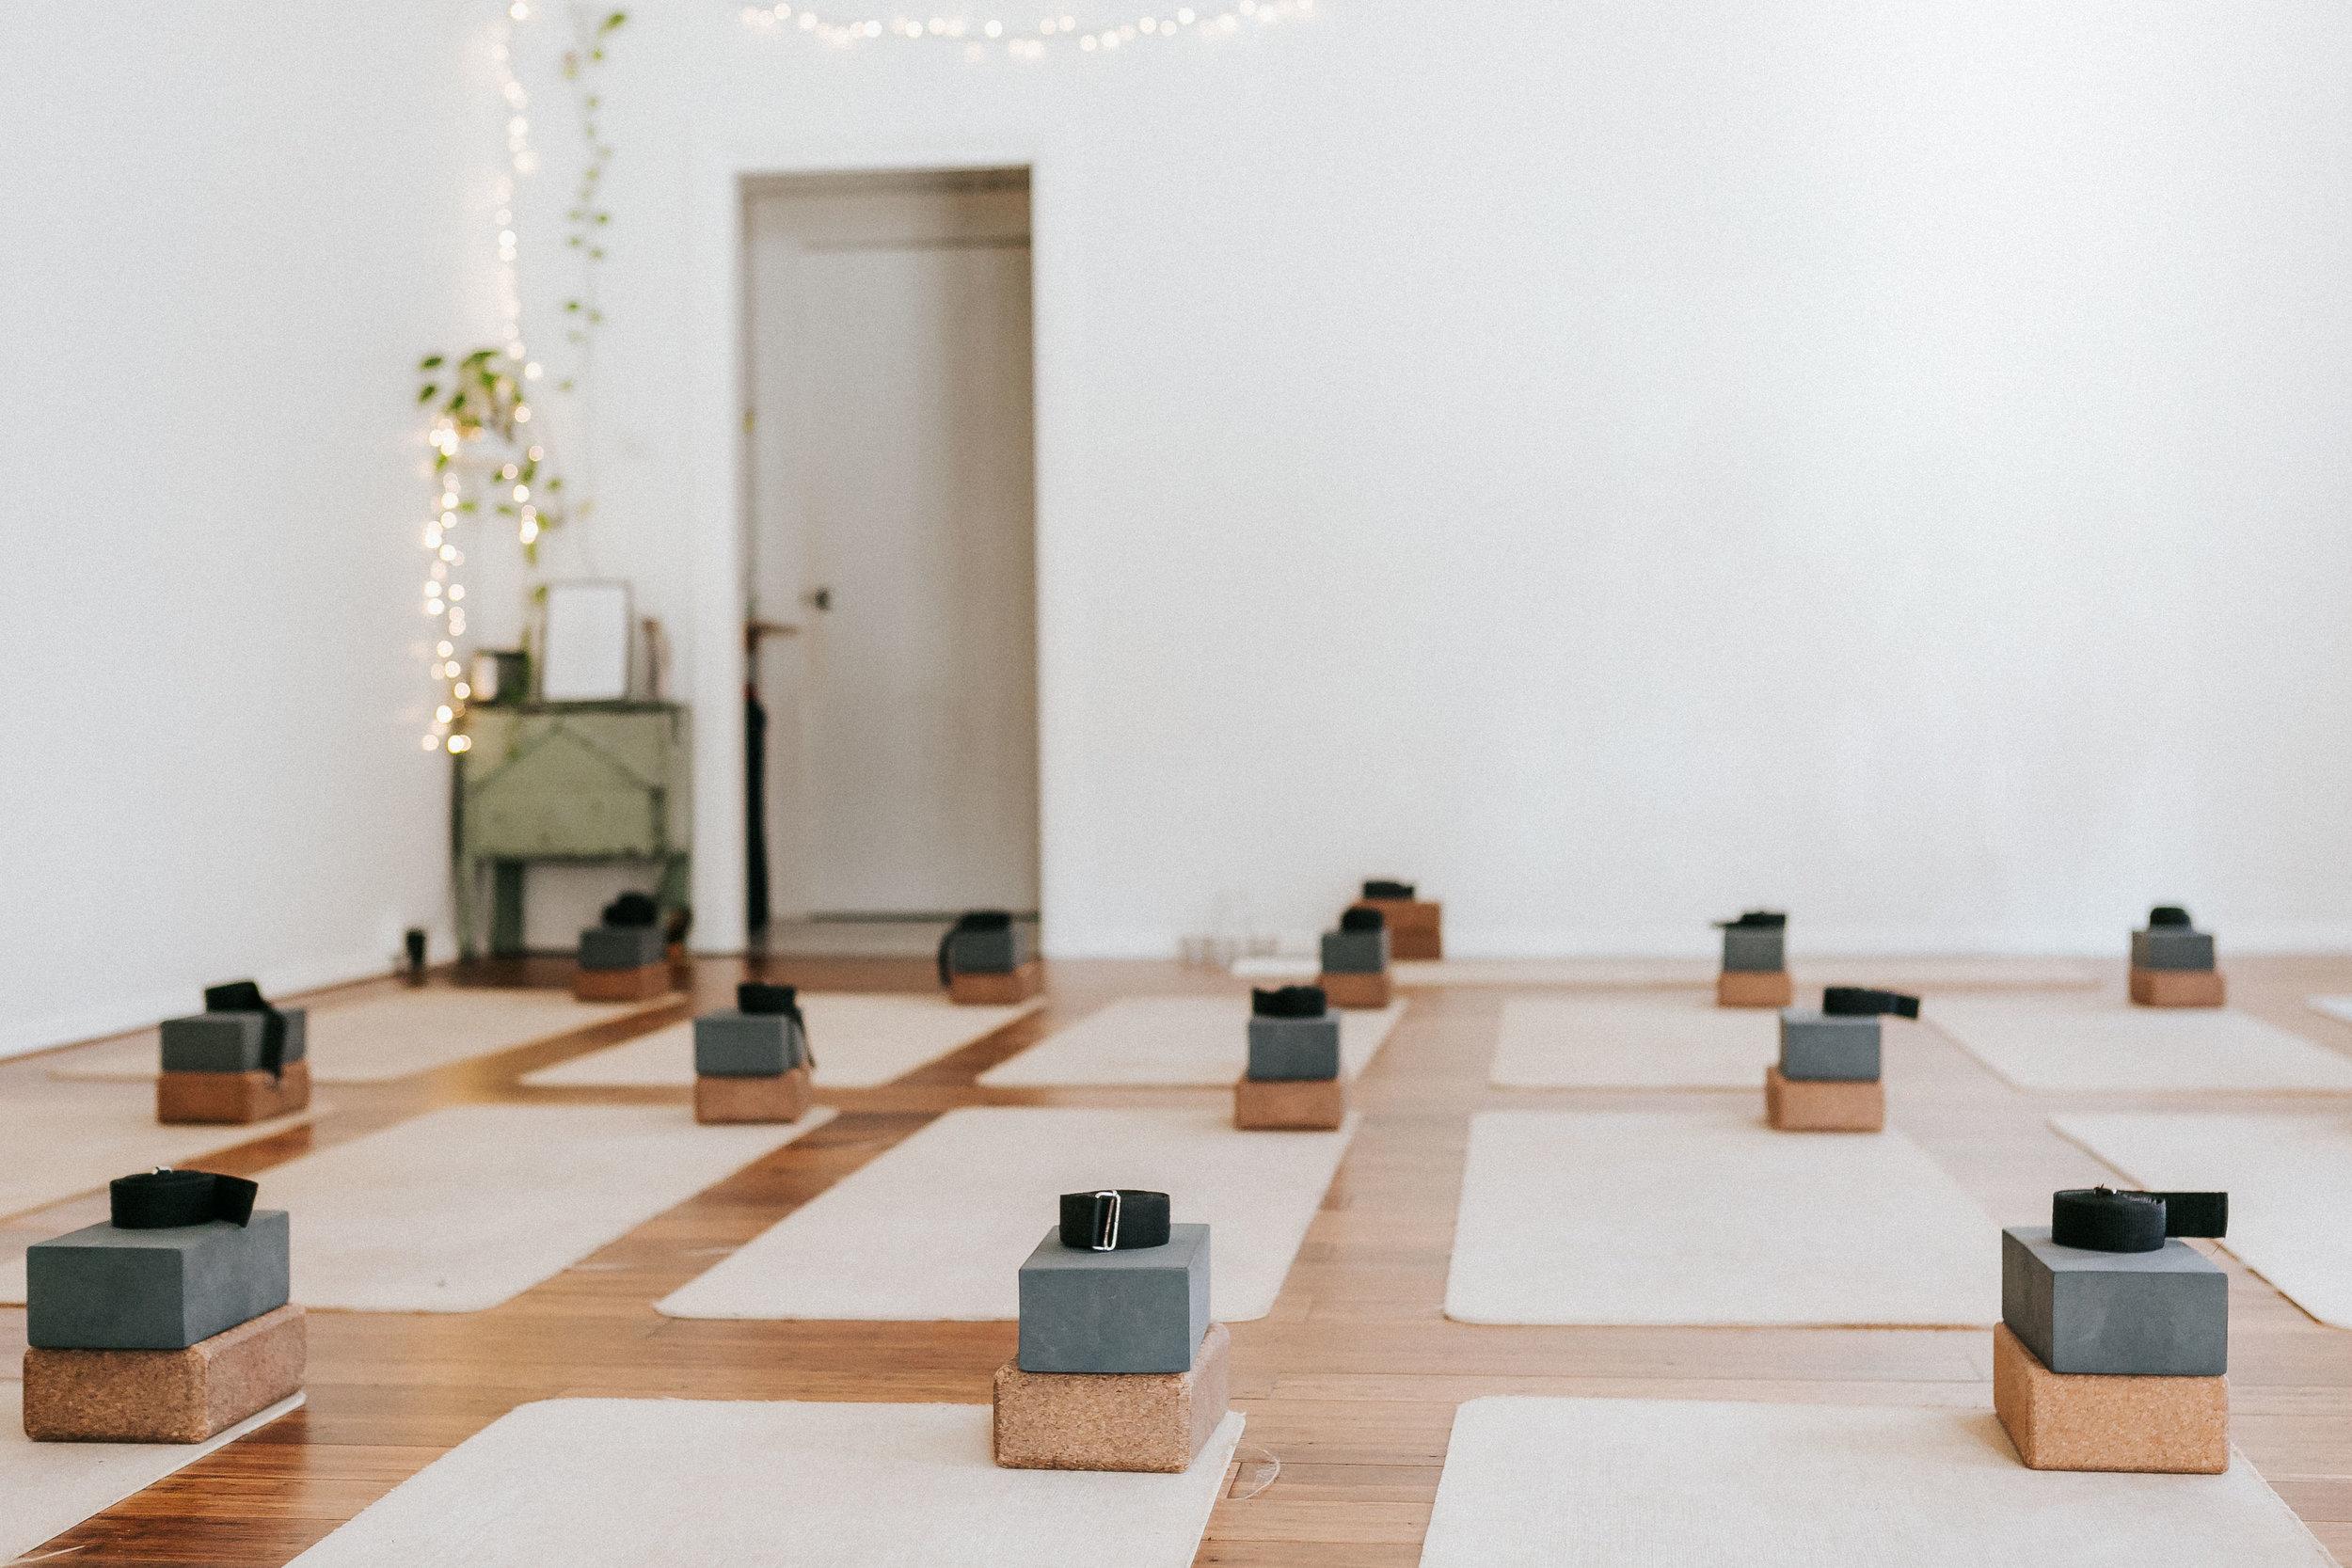 yogaforall272.jpg